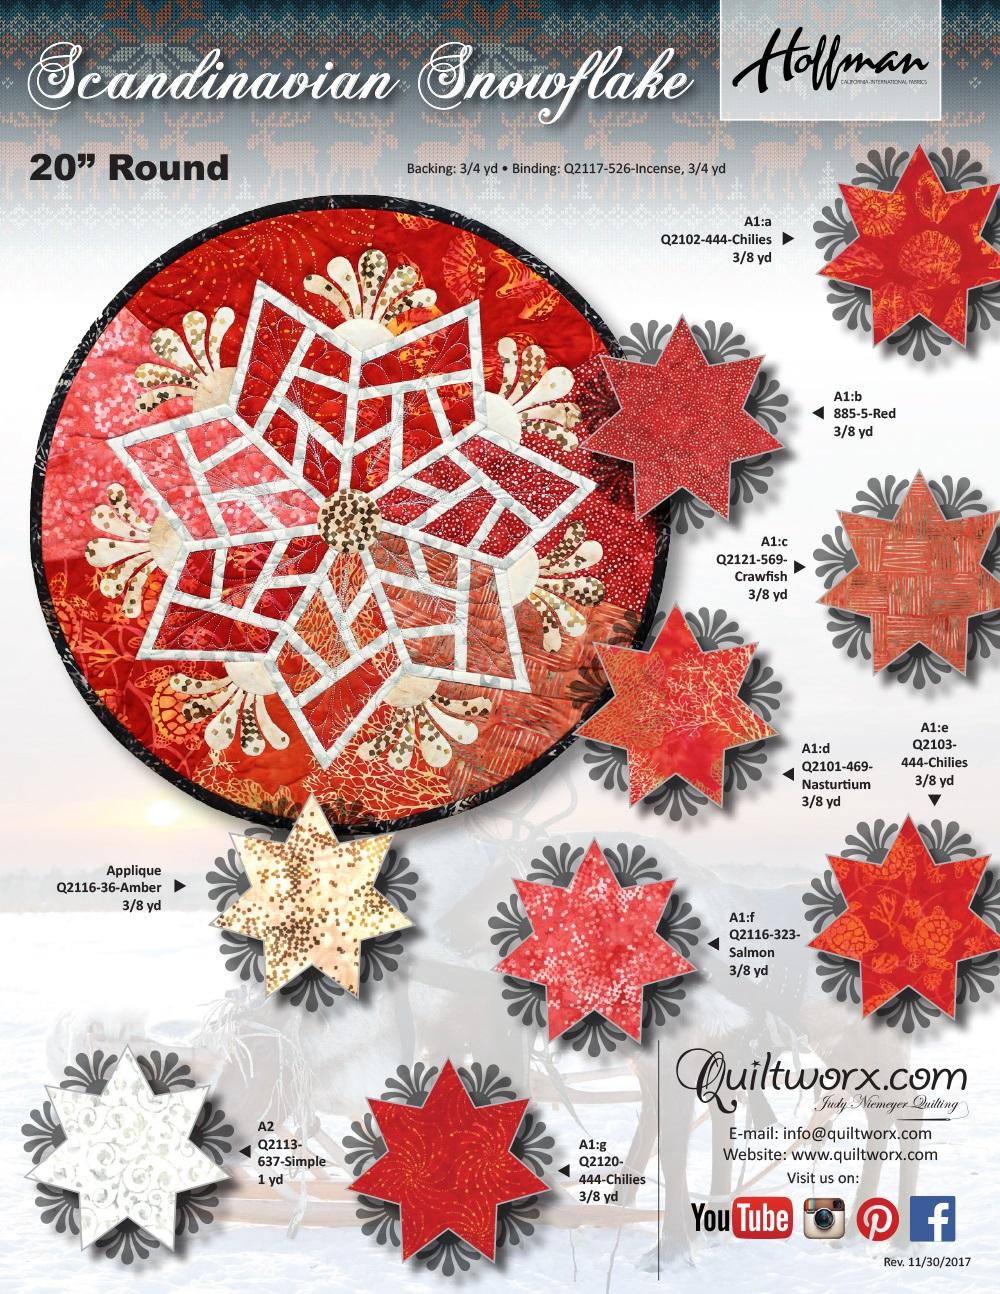 Scandinavian-Snowflake-(Orange)-Hoffman-KS-1